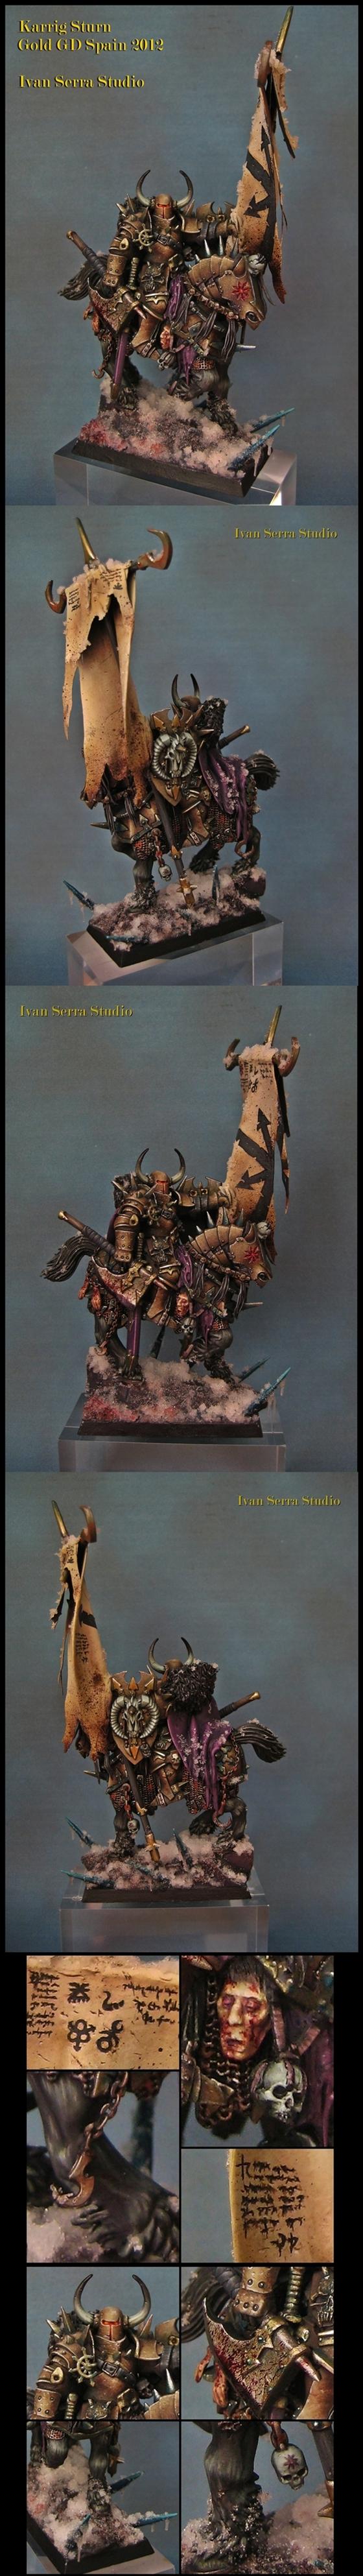 Karrig Sturn, chaos warrior